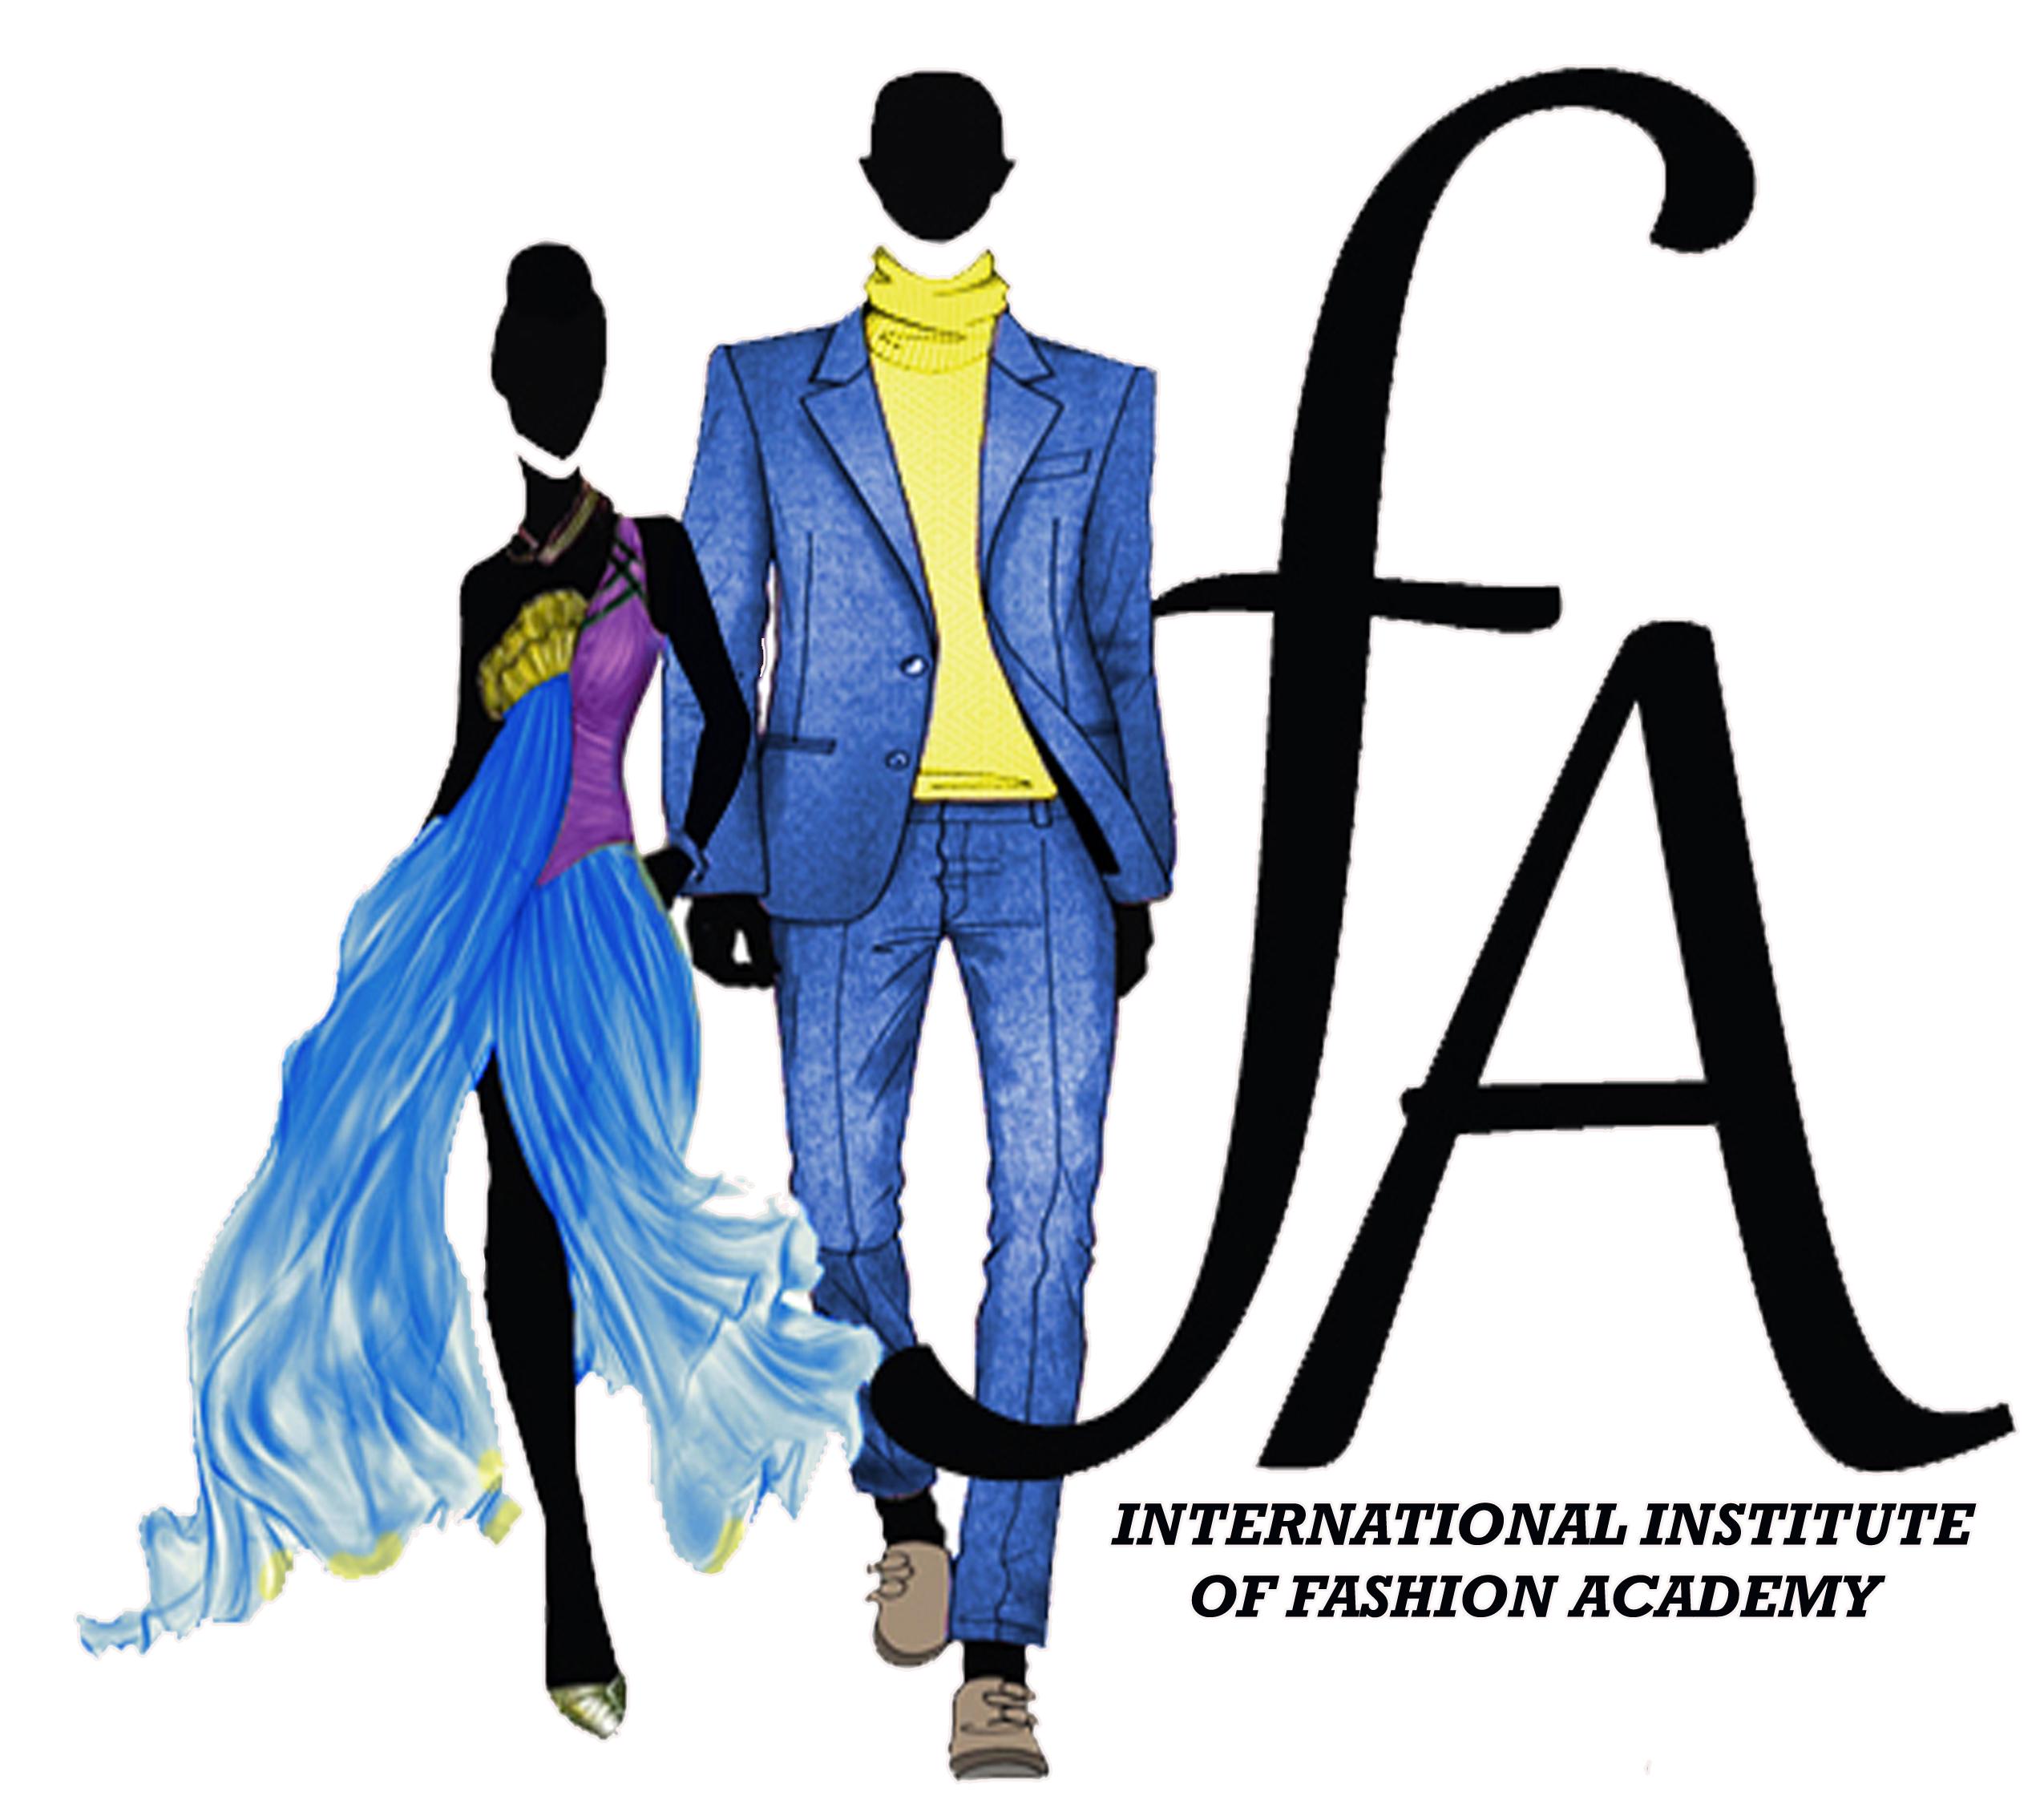 Iifa top fashion designing. Clipart woman interior designer